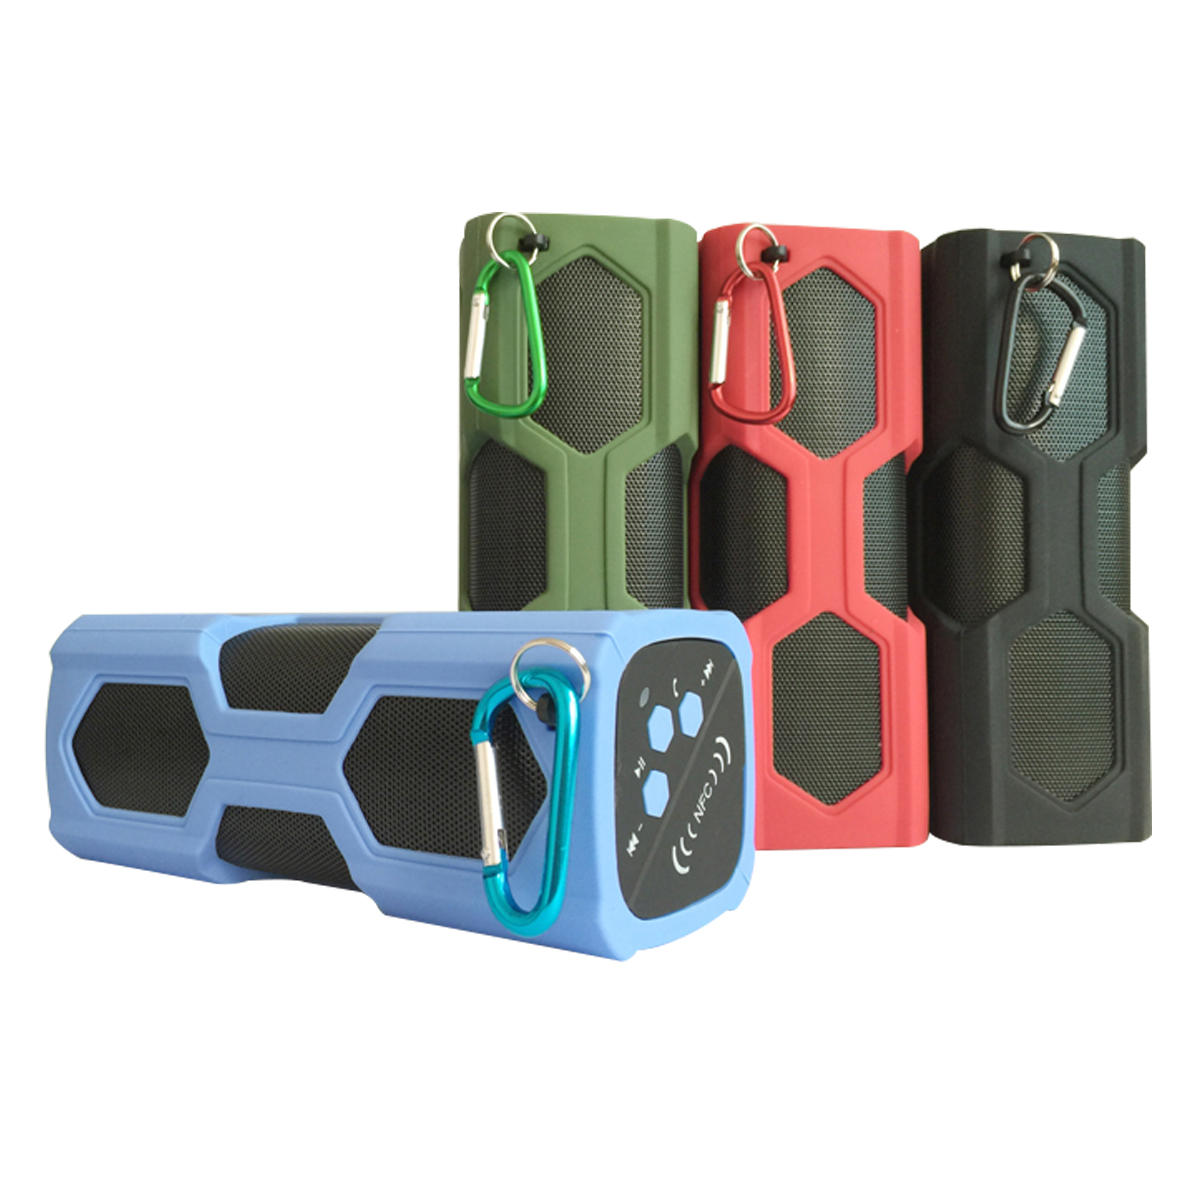 Elegiant IPX4 Waterproof Shockproof bluetooth Speaker Portable Bass Subwoofer